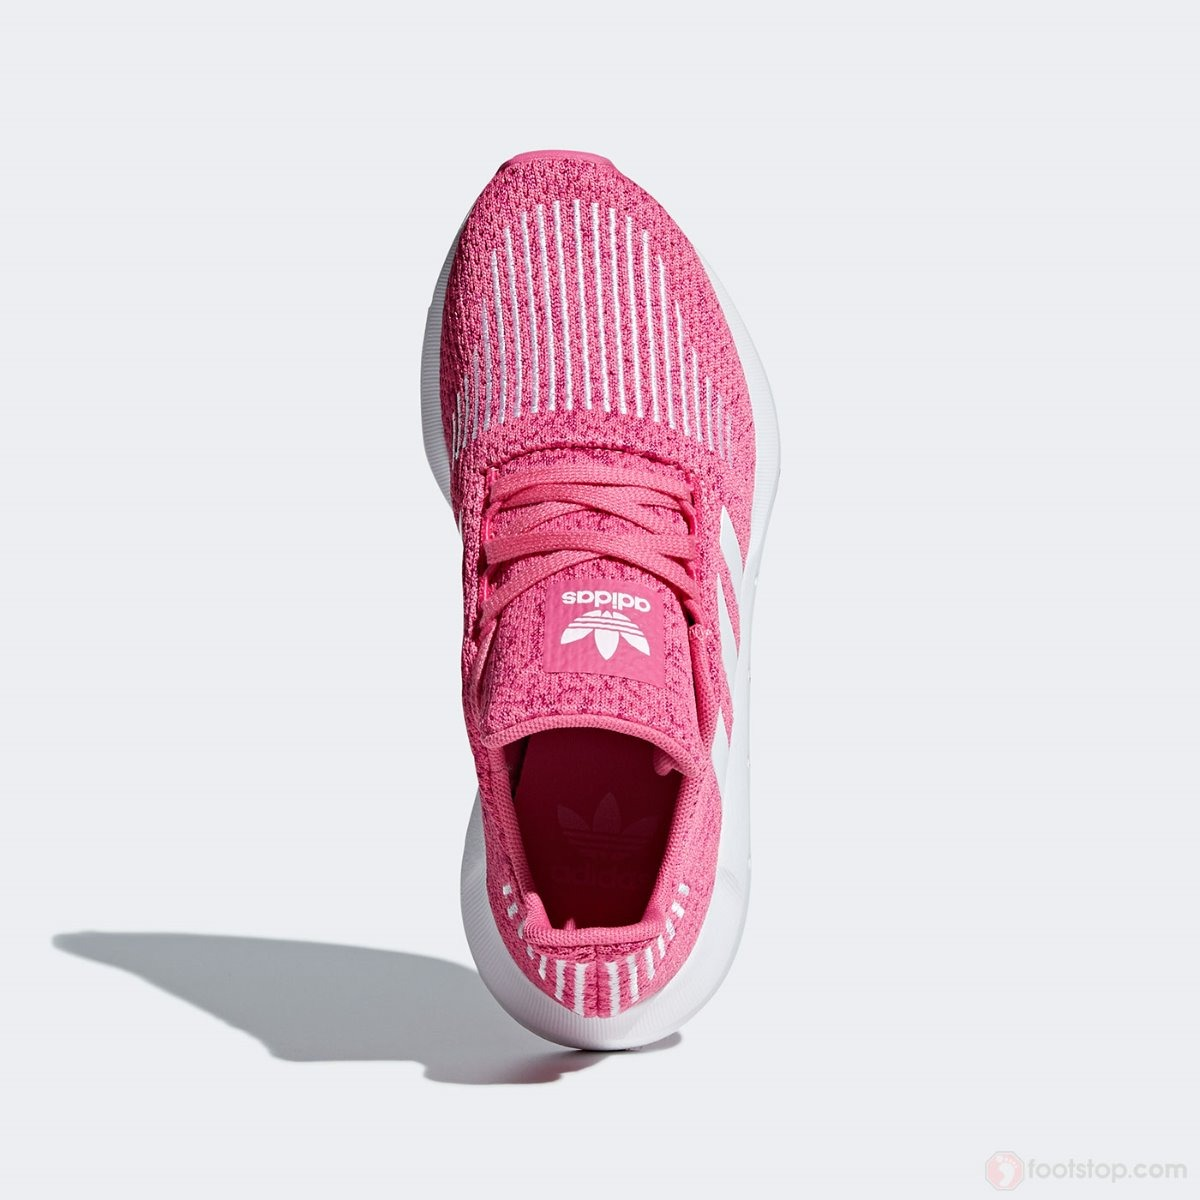 8765243c48efb Tenis adidas Swift Run Rosa .)   23.5